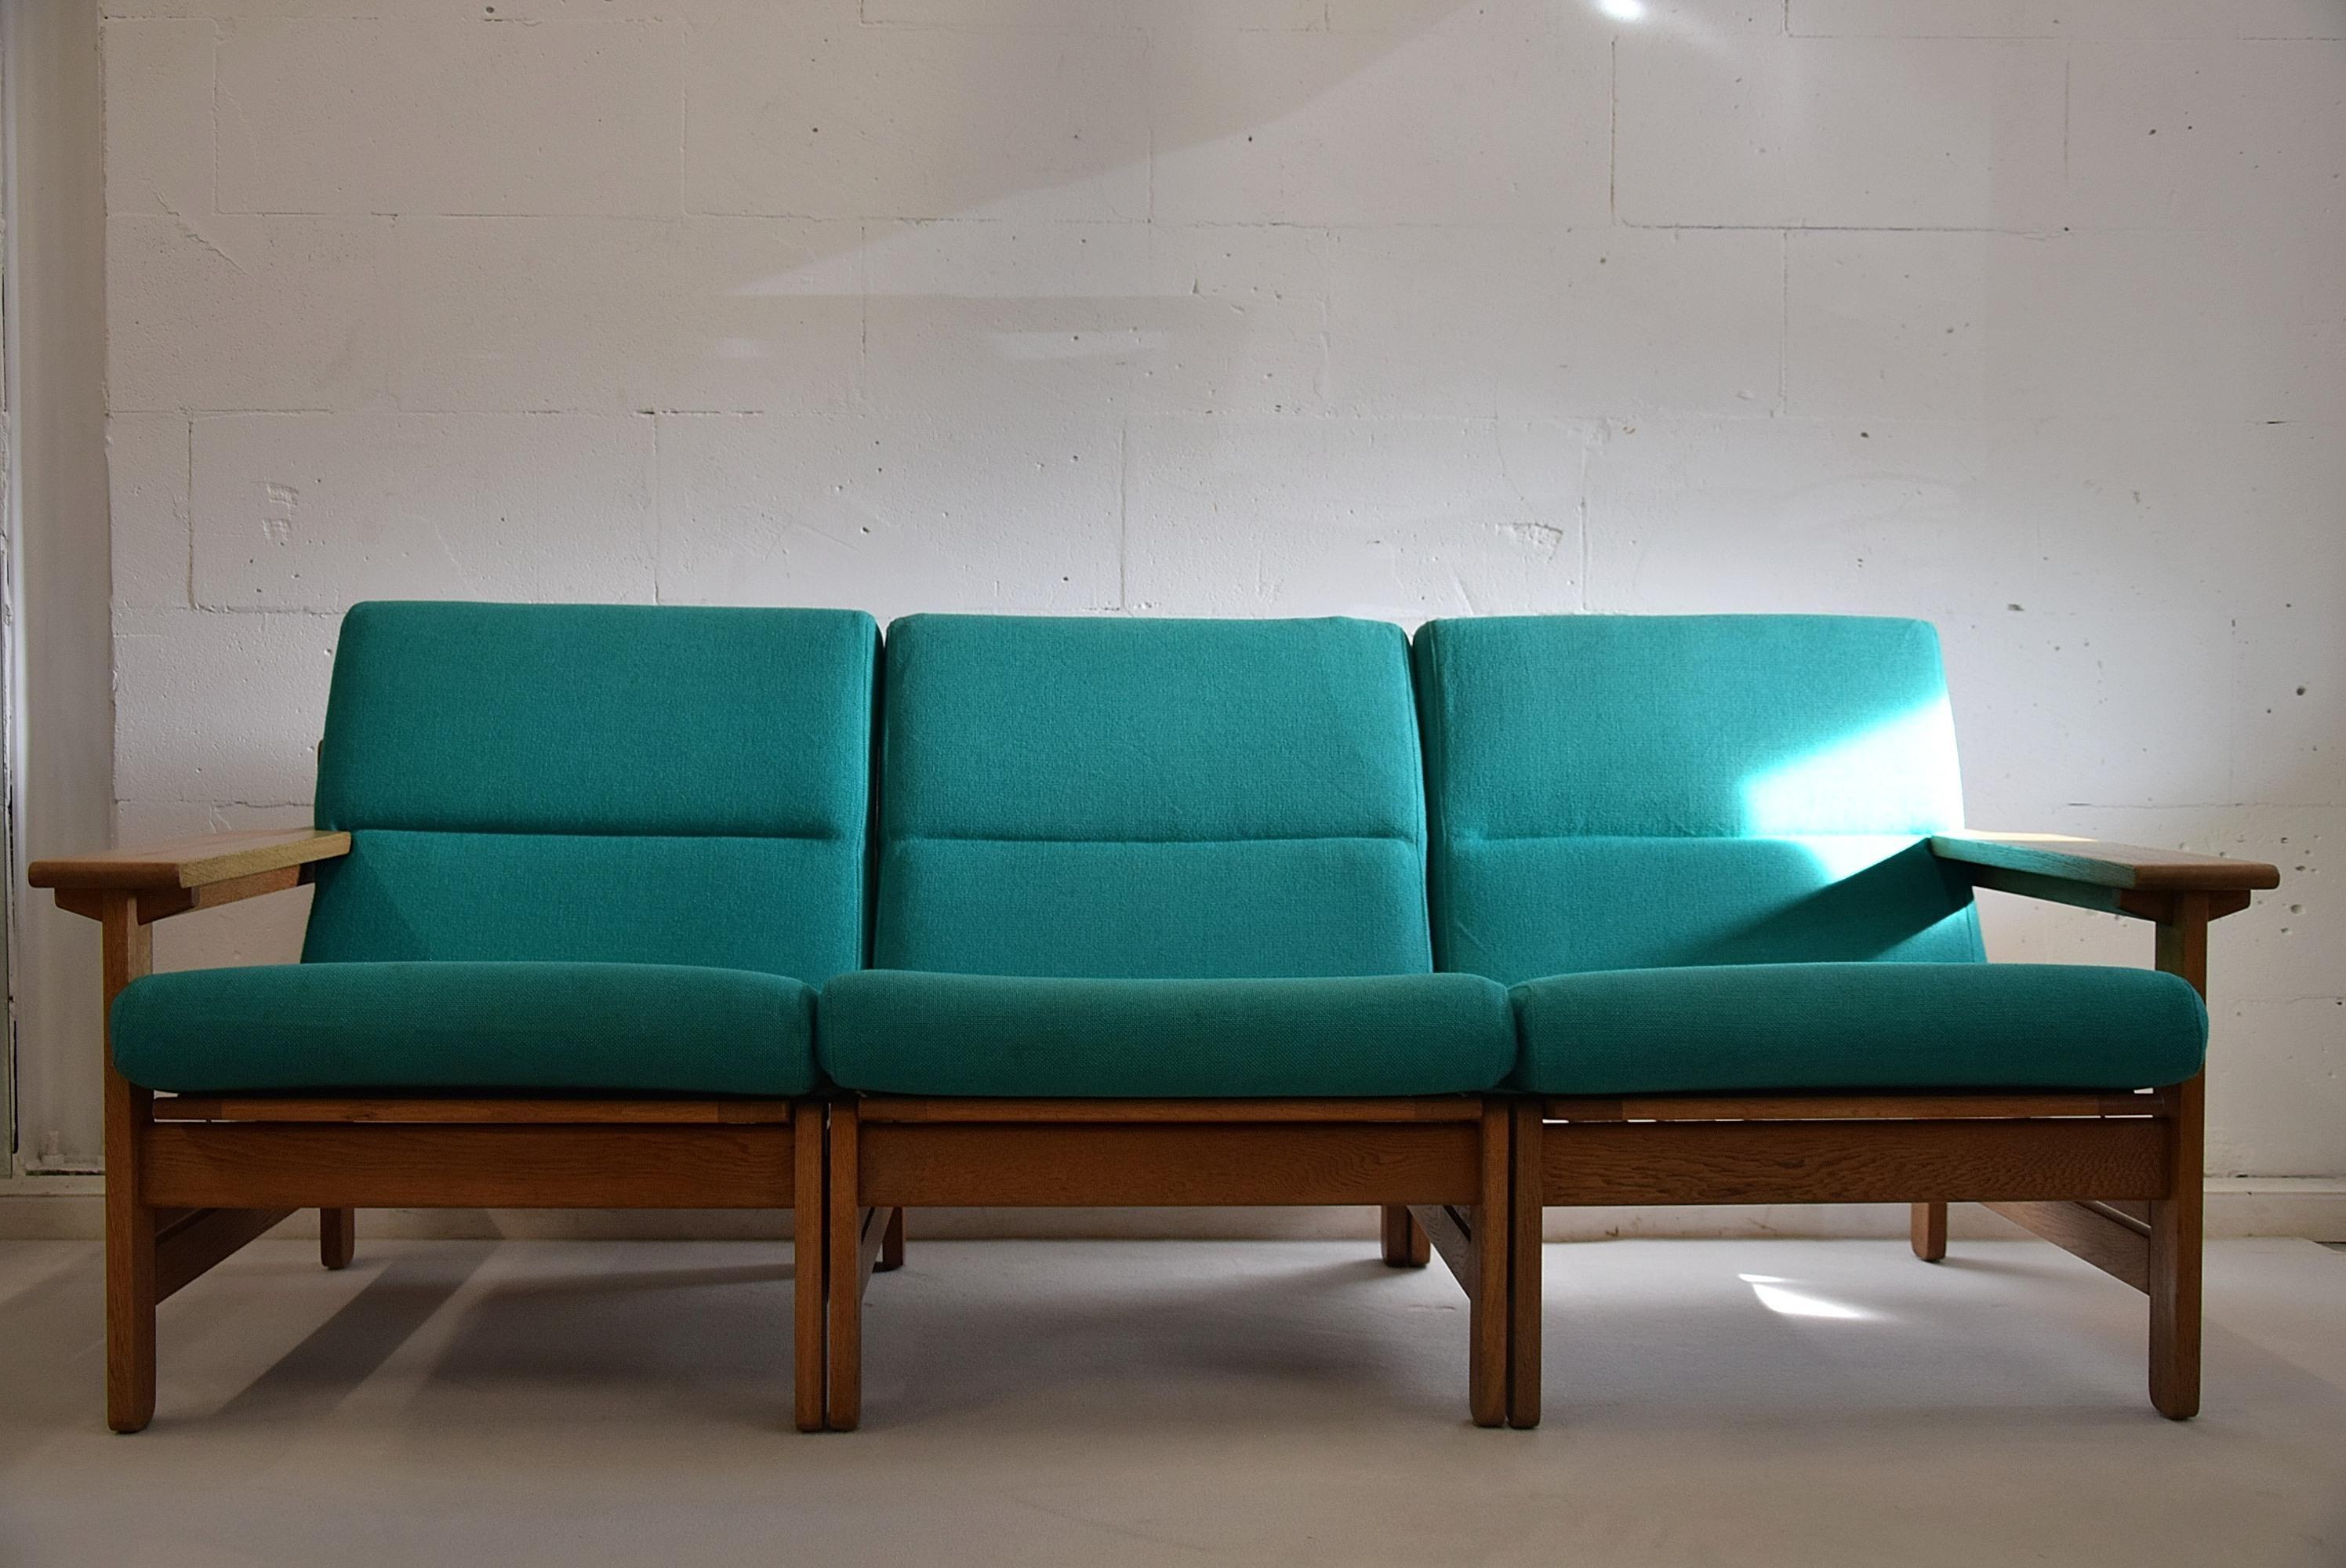 Loungeset kwantum verbazingwekkend modern interieur lounge